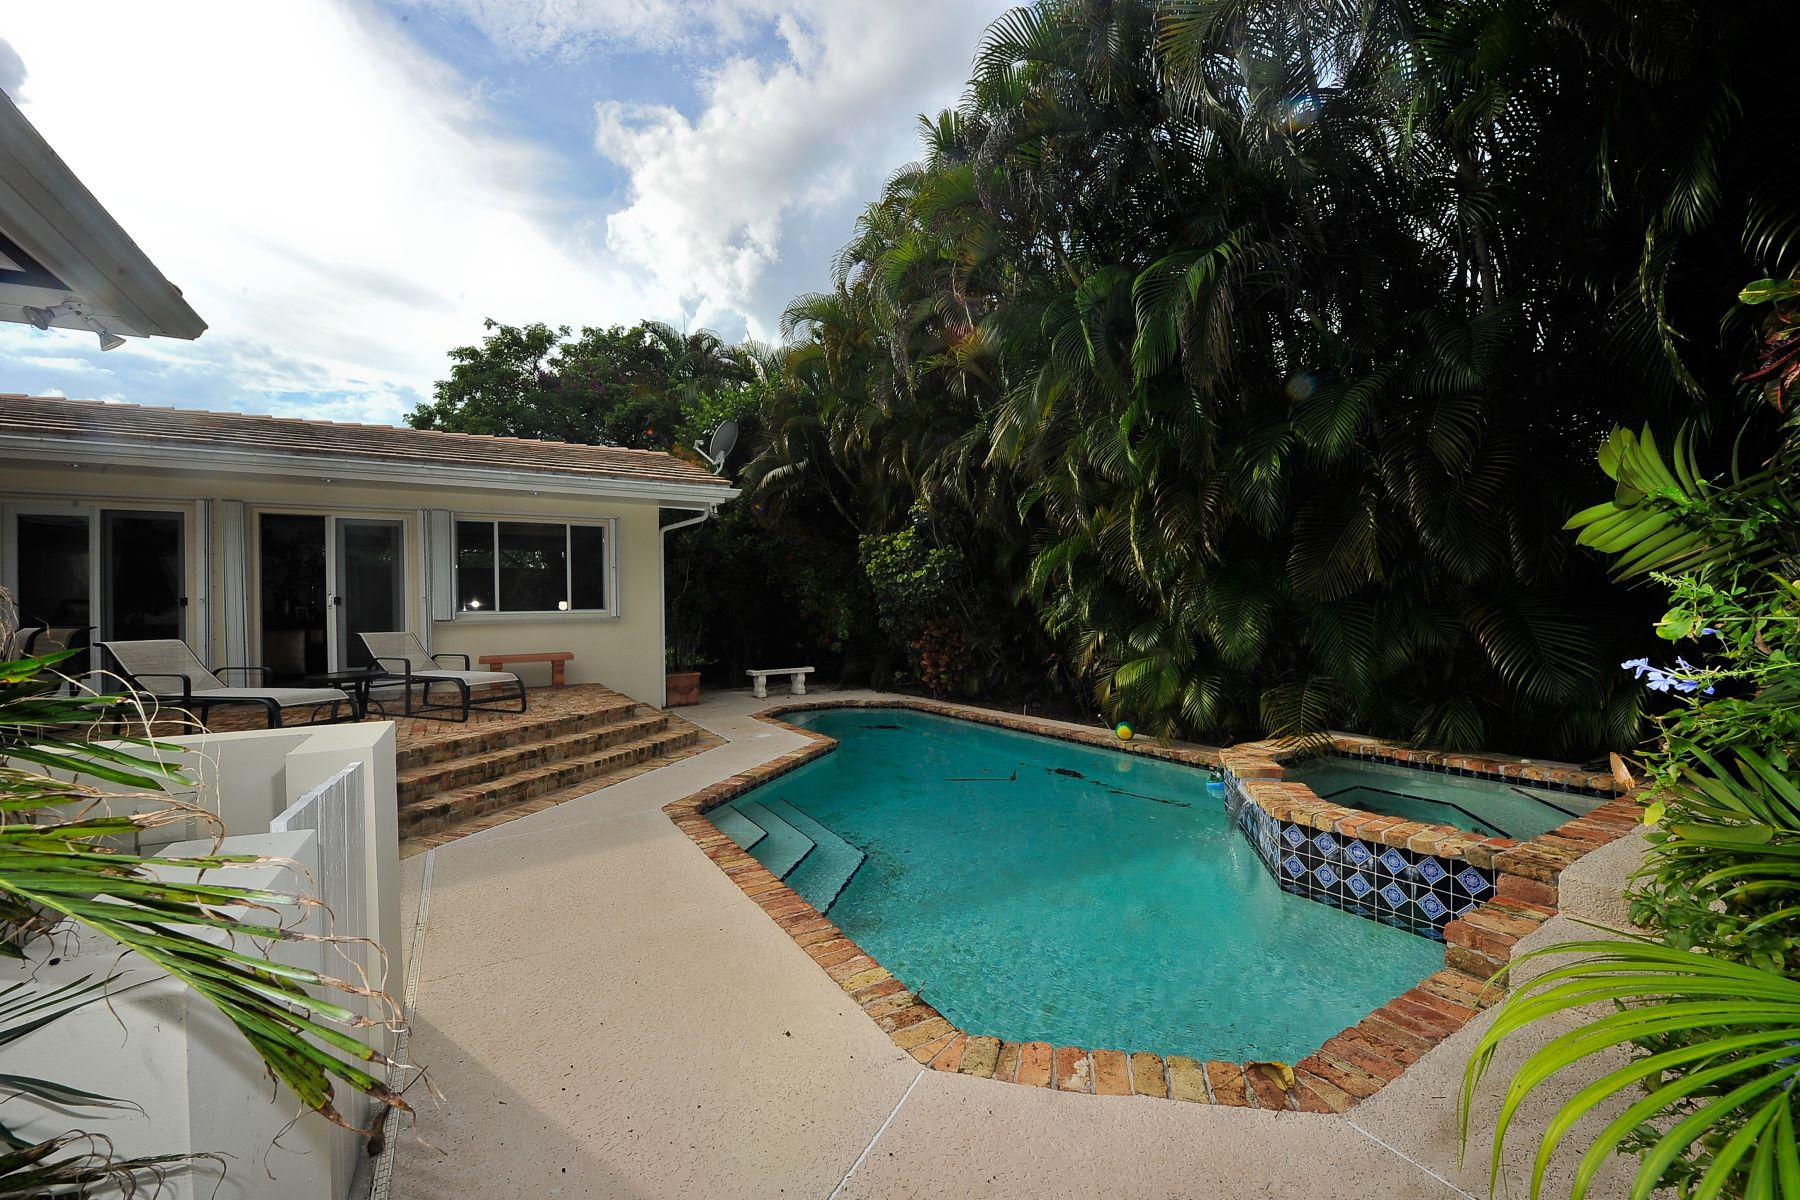 واحد منزل الأسرة للـ Rent في 1425 Trillo Ave 1425 Trillo Ave Coral Gables, Florida 33146 United States